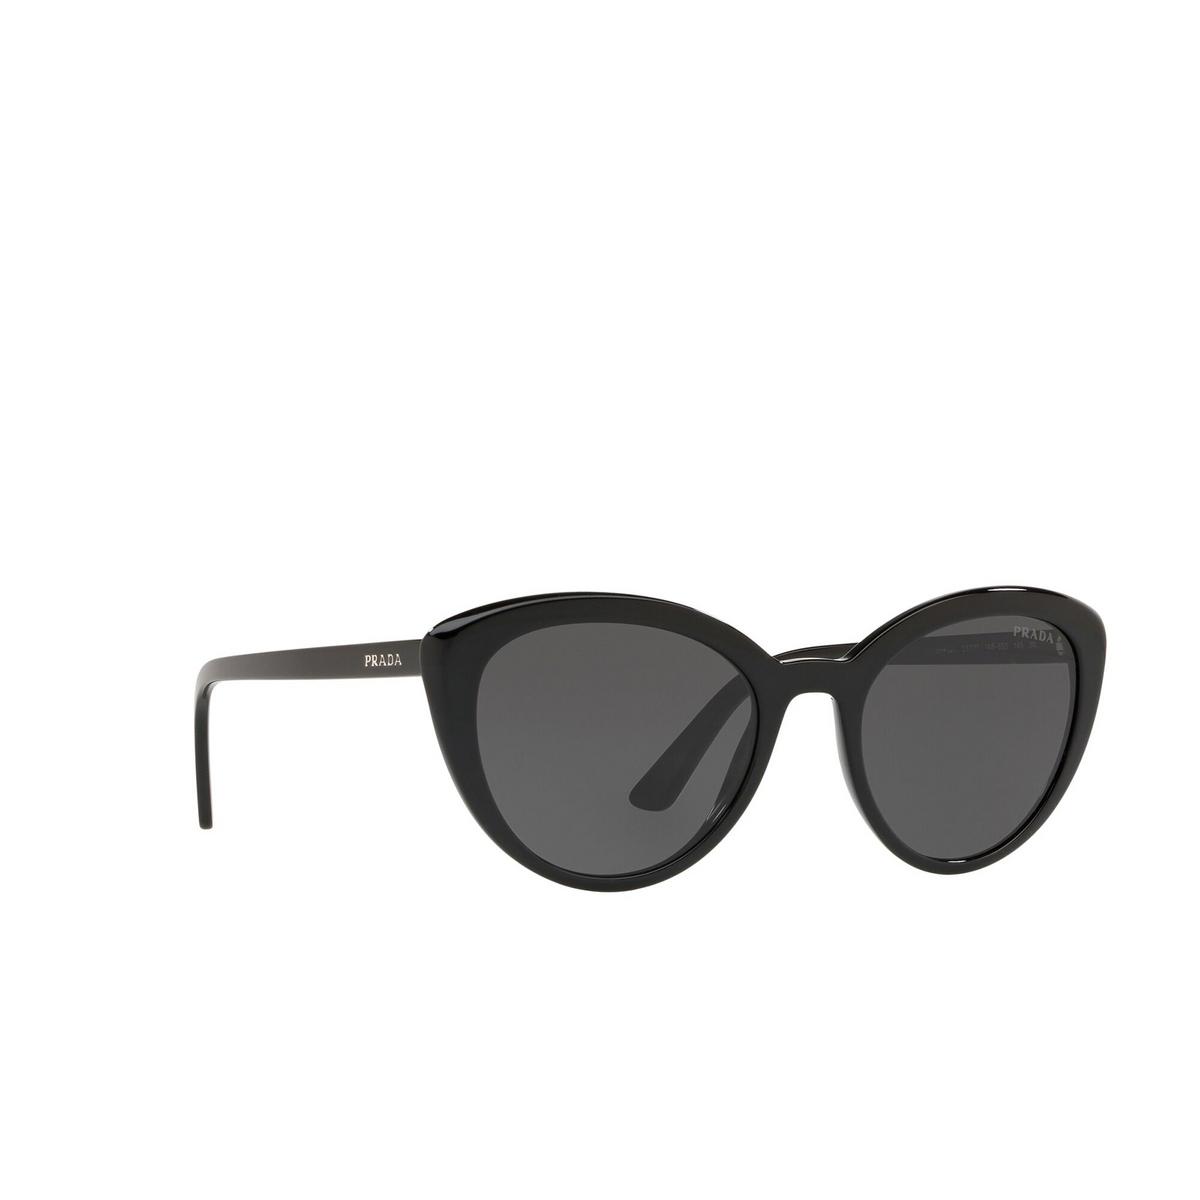 Prada® Cat-eye Sunglasses: PR 02VS color Black 1AB5S0 - three-quarters view.